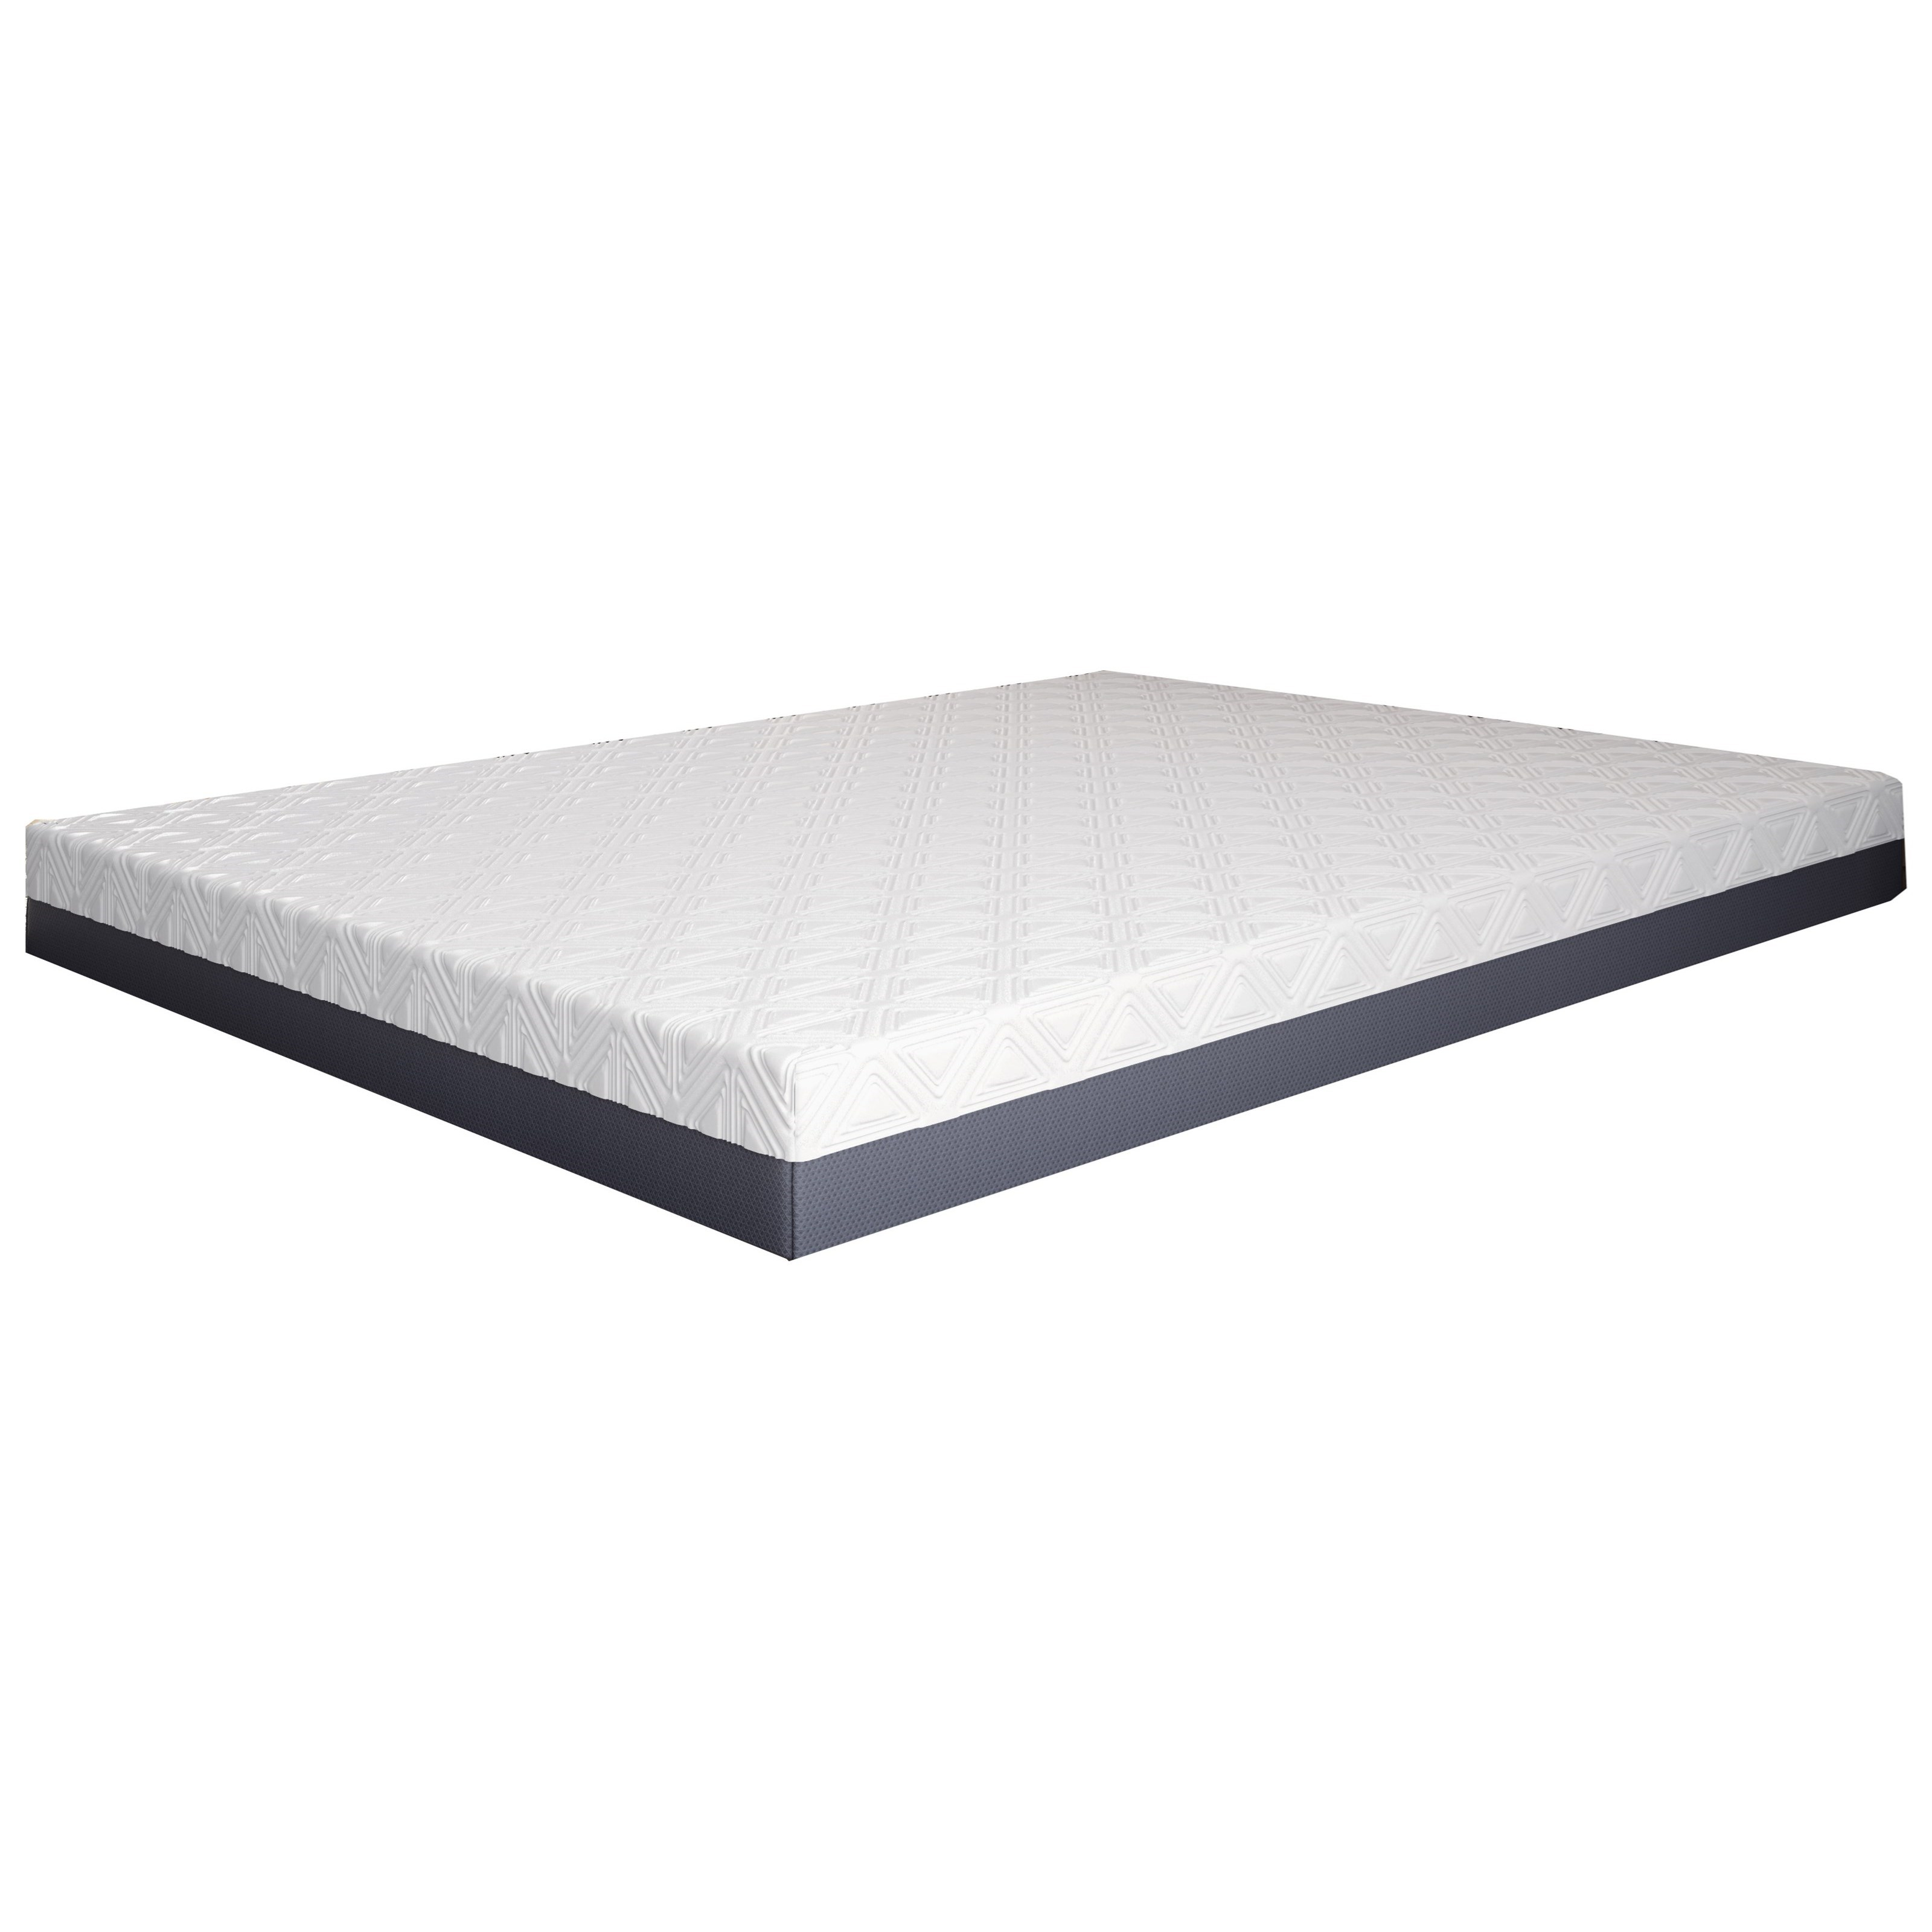 "Pur Gel Ashland 8 Full 8"" Firm Gel Memory Foam Mattress by BedTech at Home Furnishings Direct"